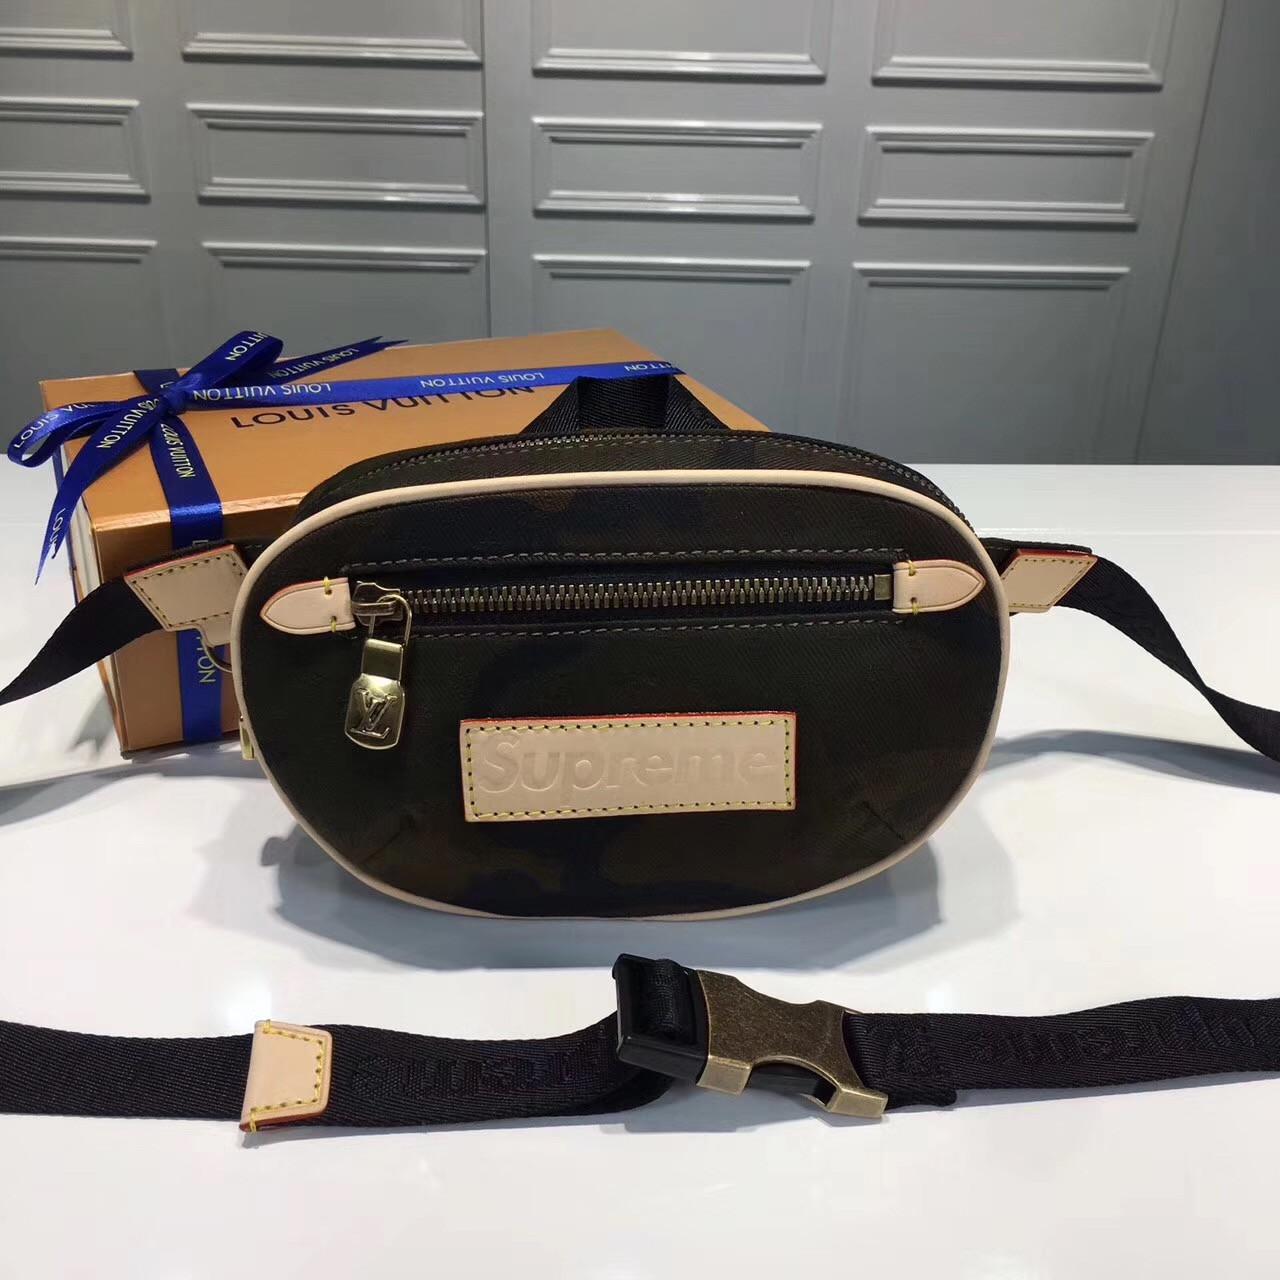 06c4ebe14257 Supreme X Louis Vuitton сумка камуфляж, цена 10 400 грн., купить в Киеве —  Prom.ua (ID#619292499)